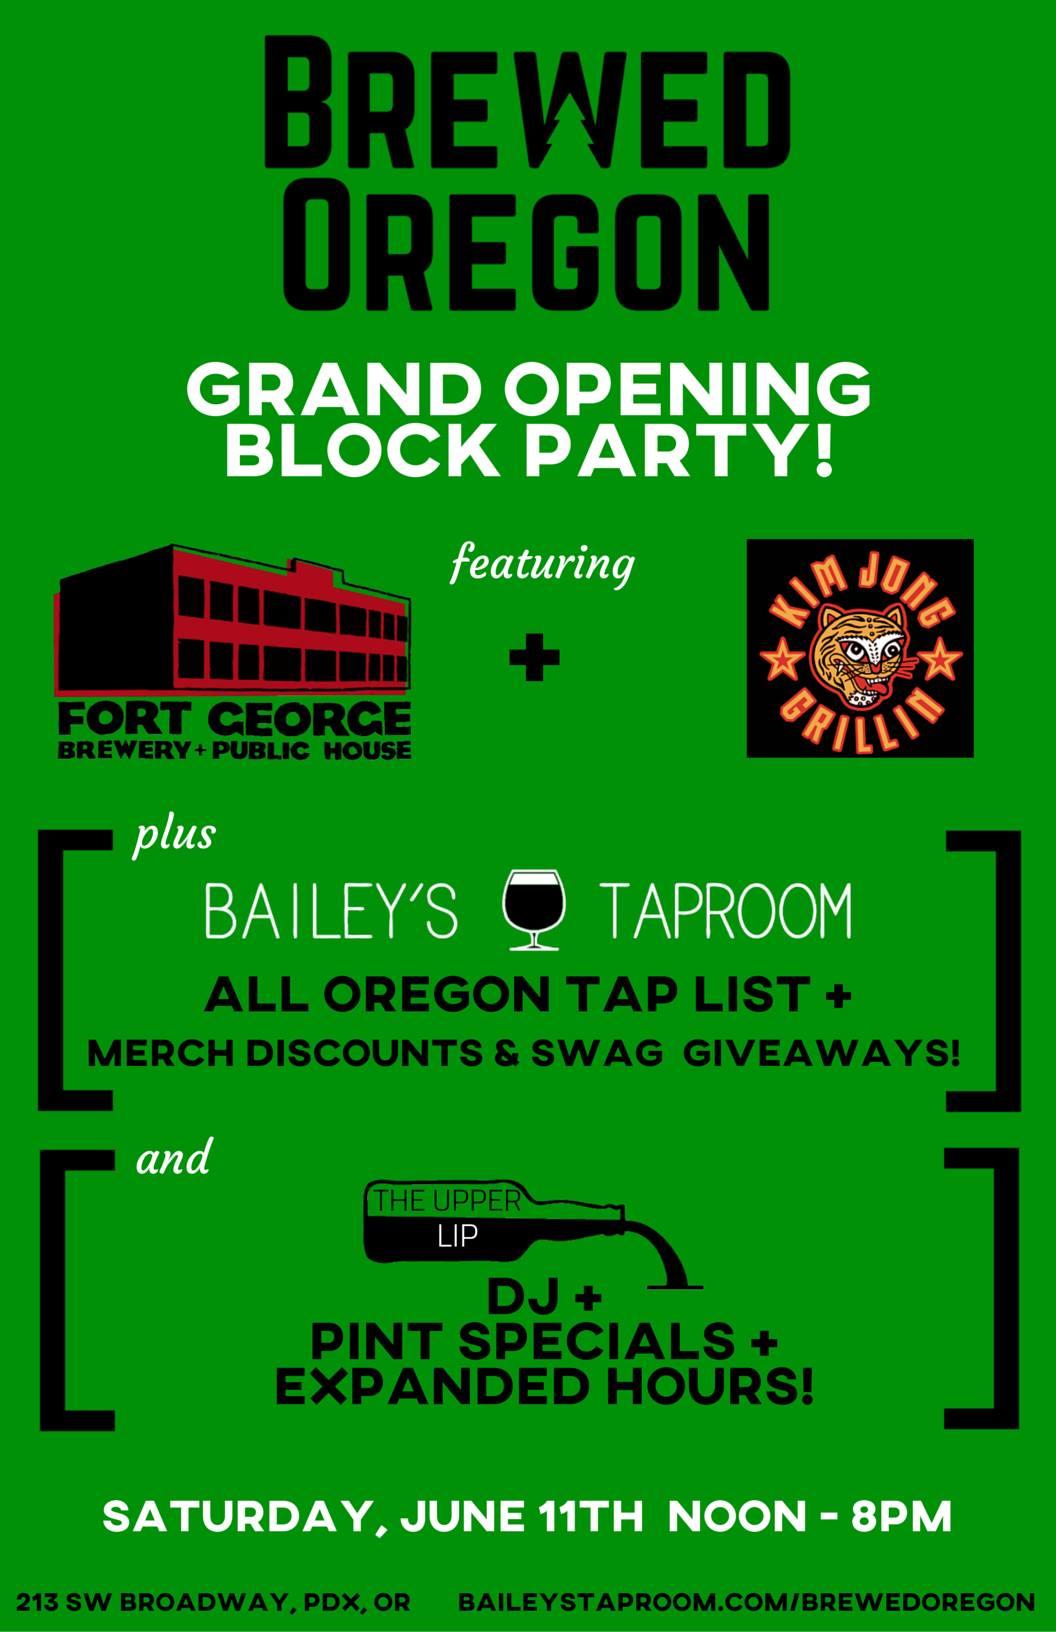 BrewedOregon Grand Opening Block Party